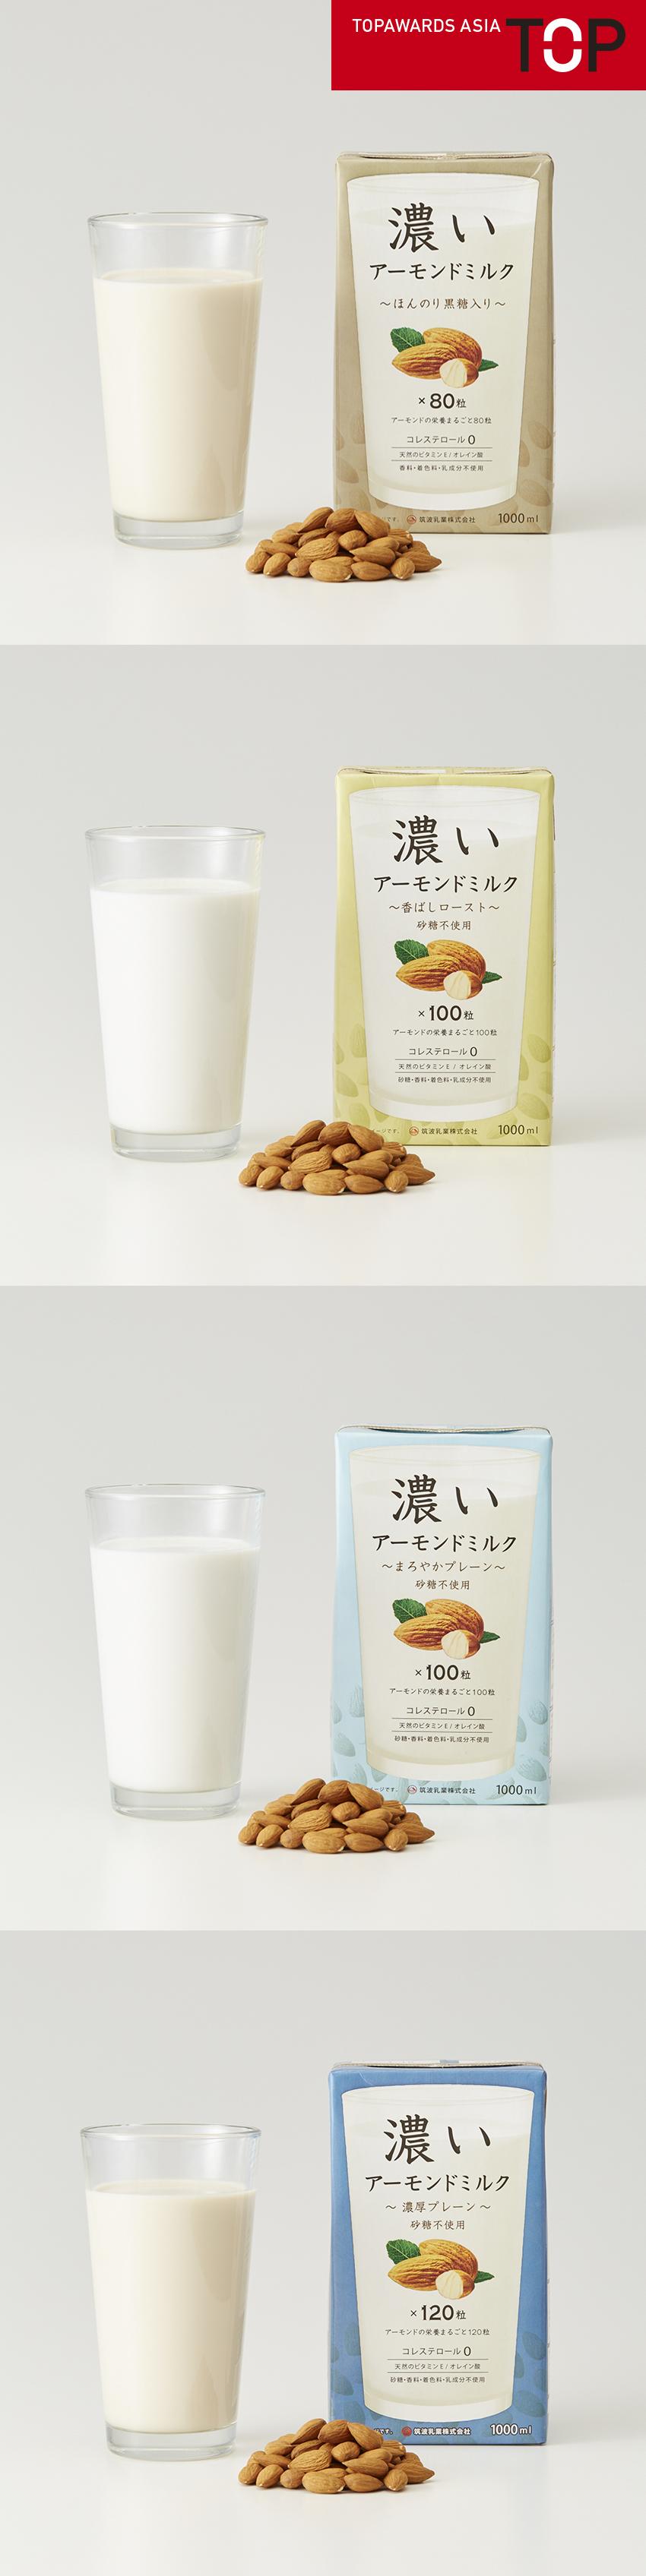 almondmilk_2.jpg